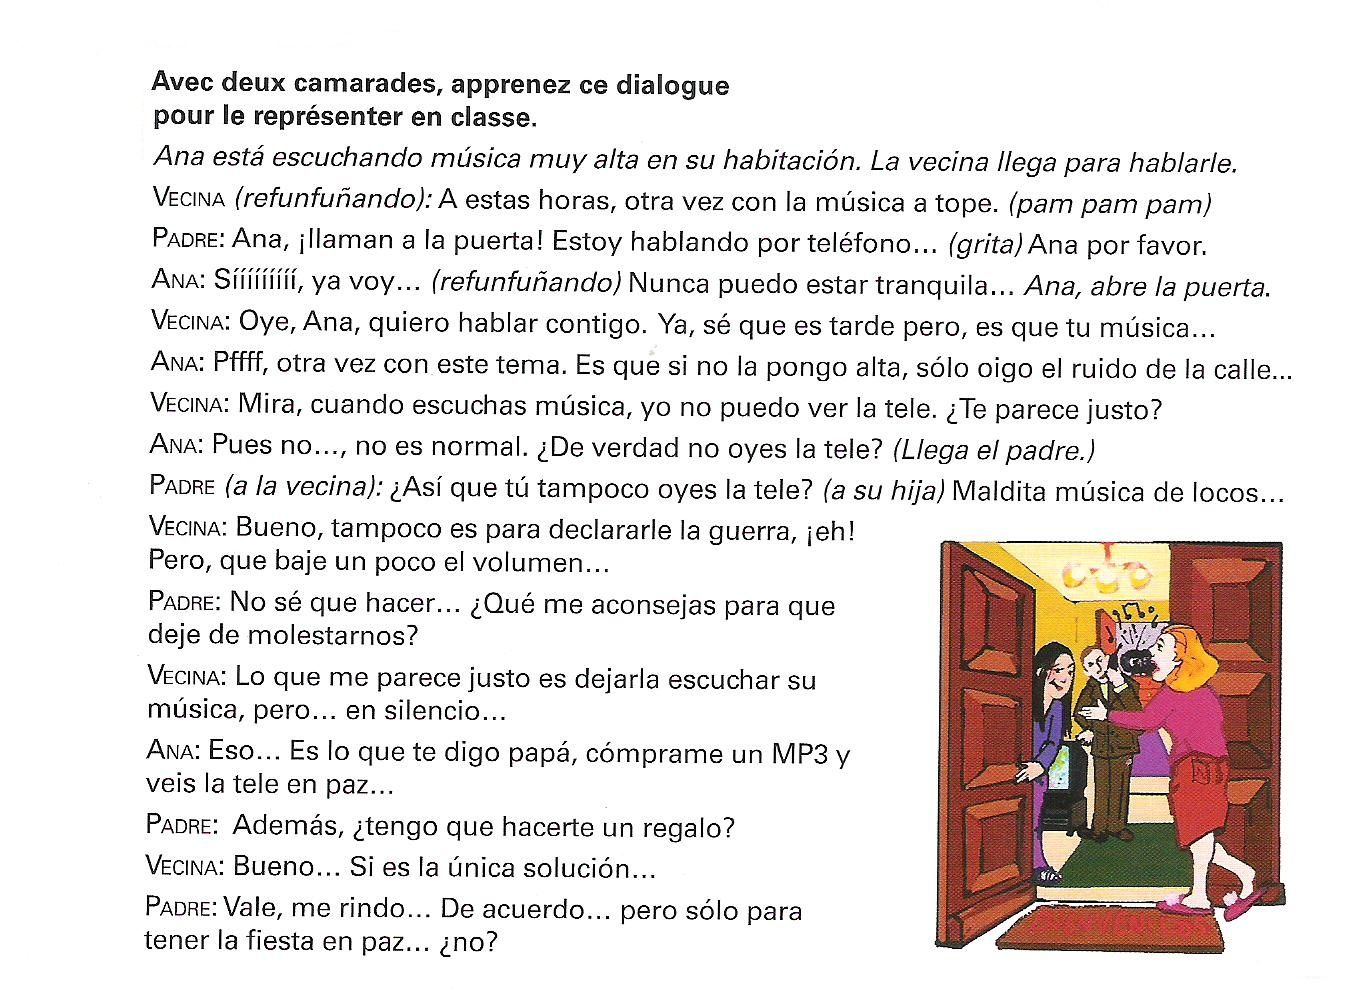 dialogue rencontre en espagnol rencontre homme valenciennes